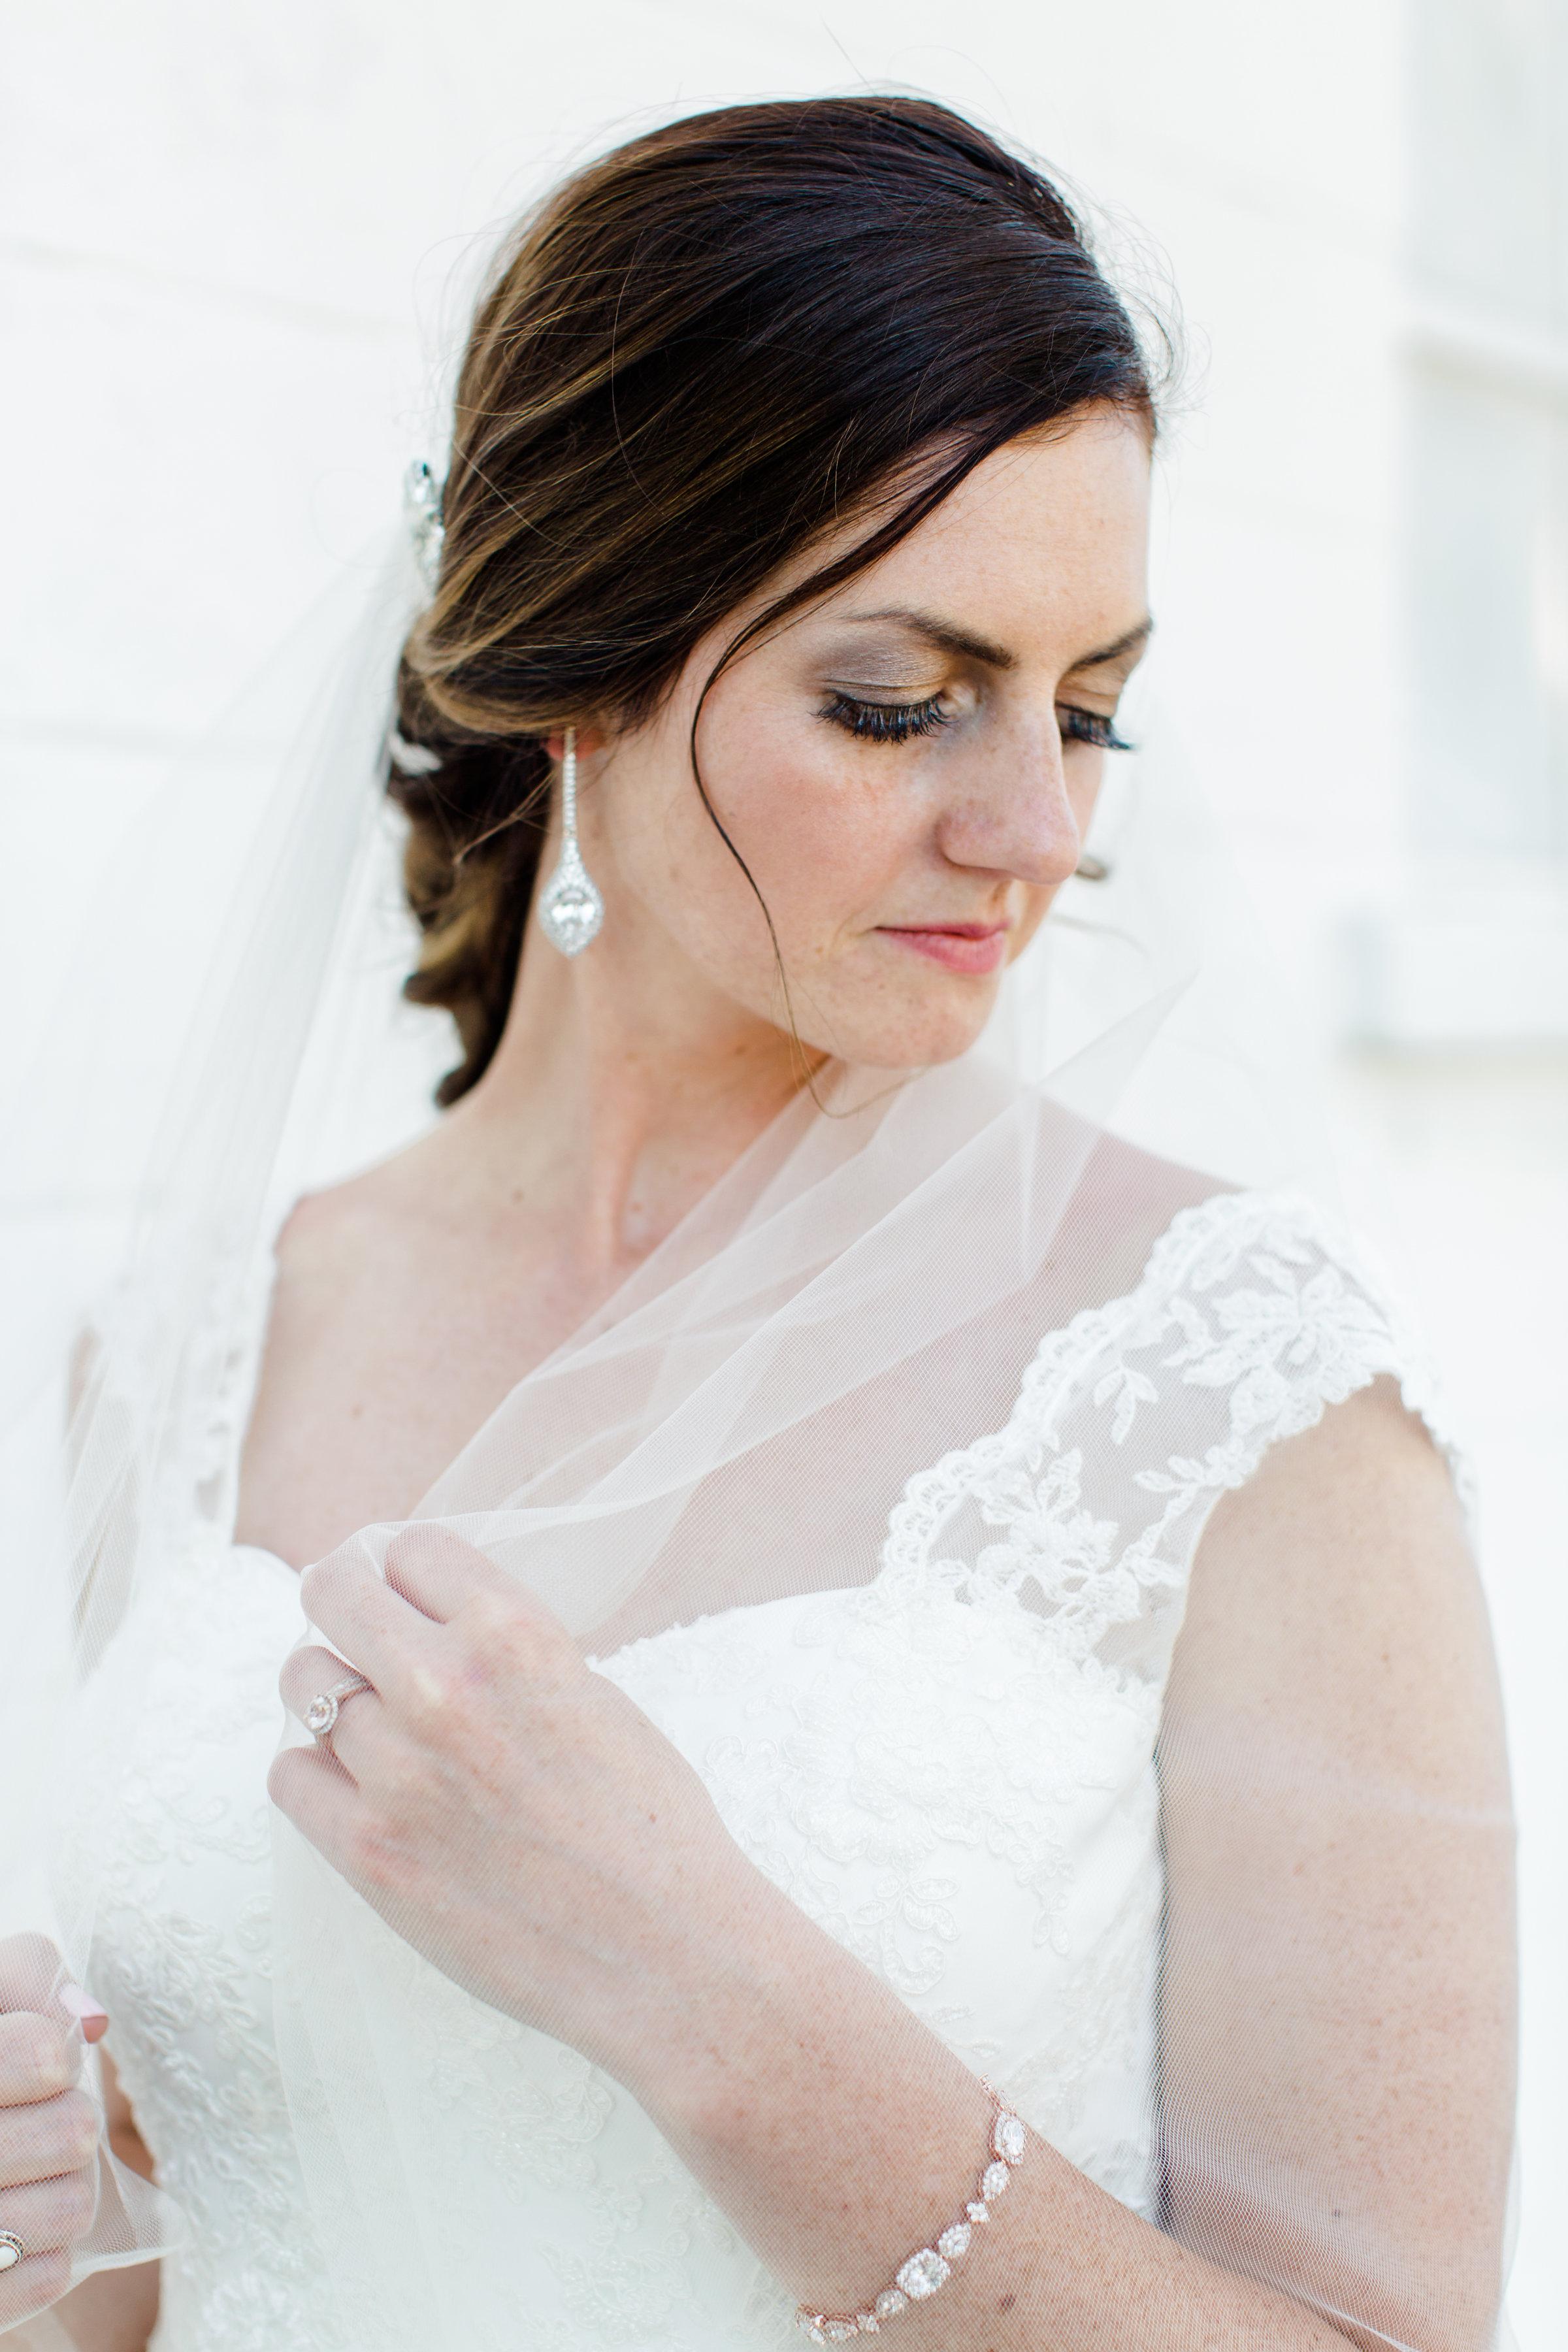 Julius+Wedding+BrideGroomb-12.jpg